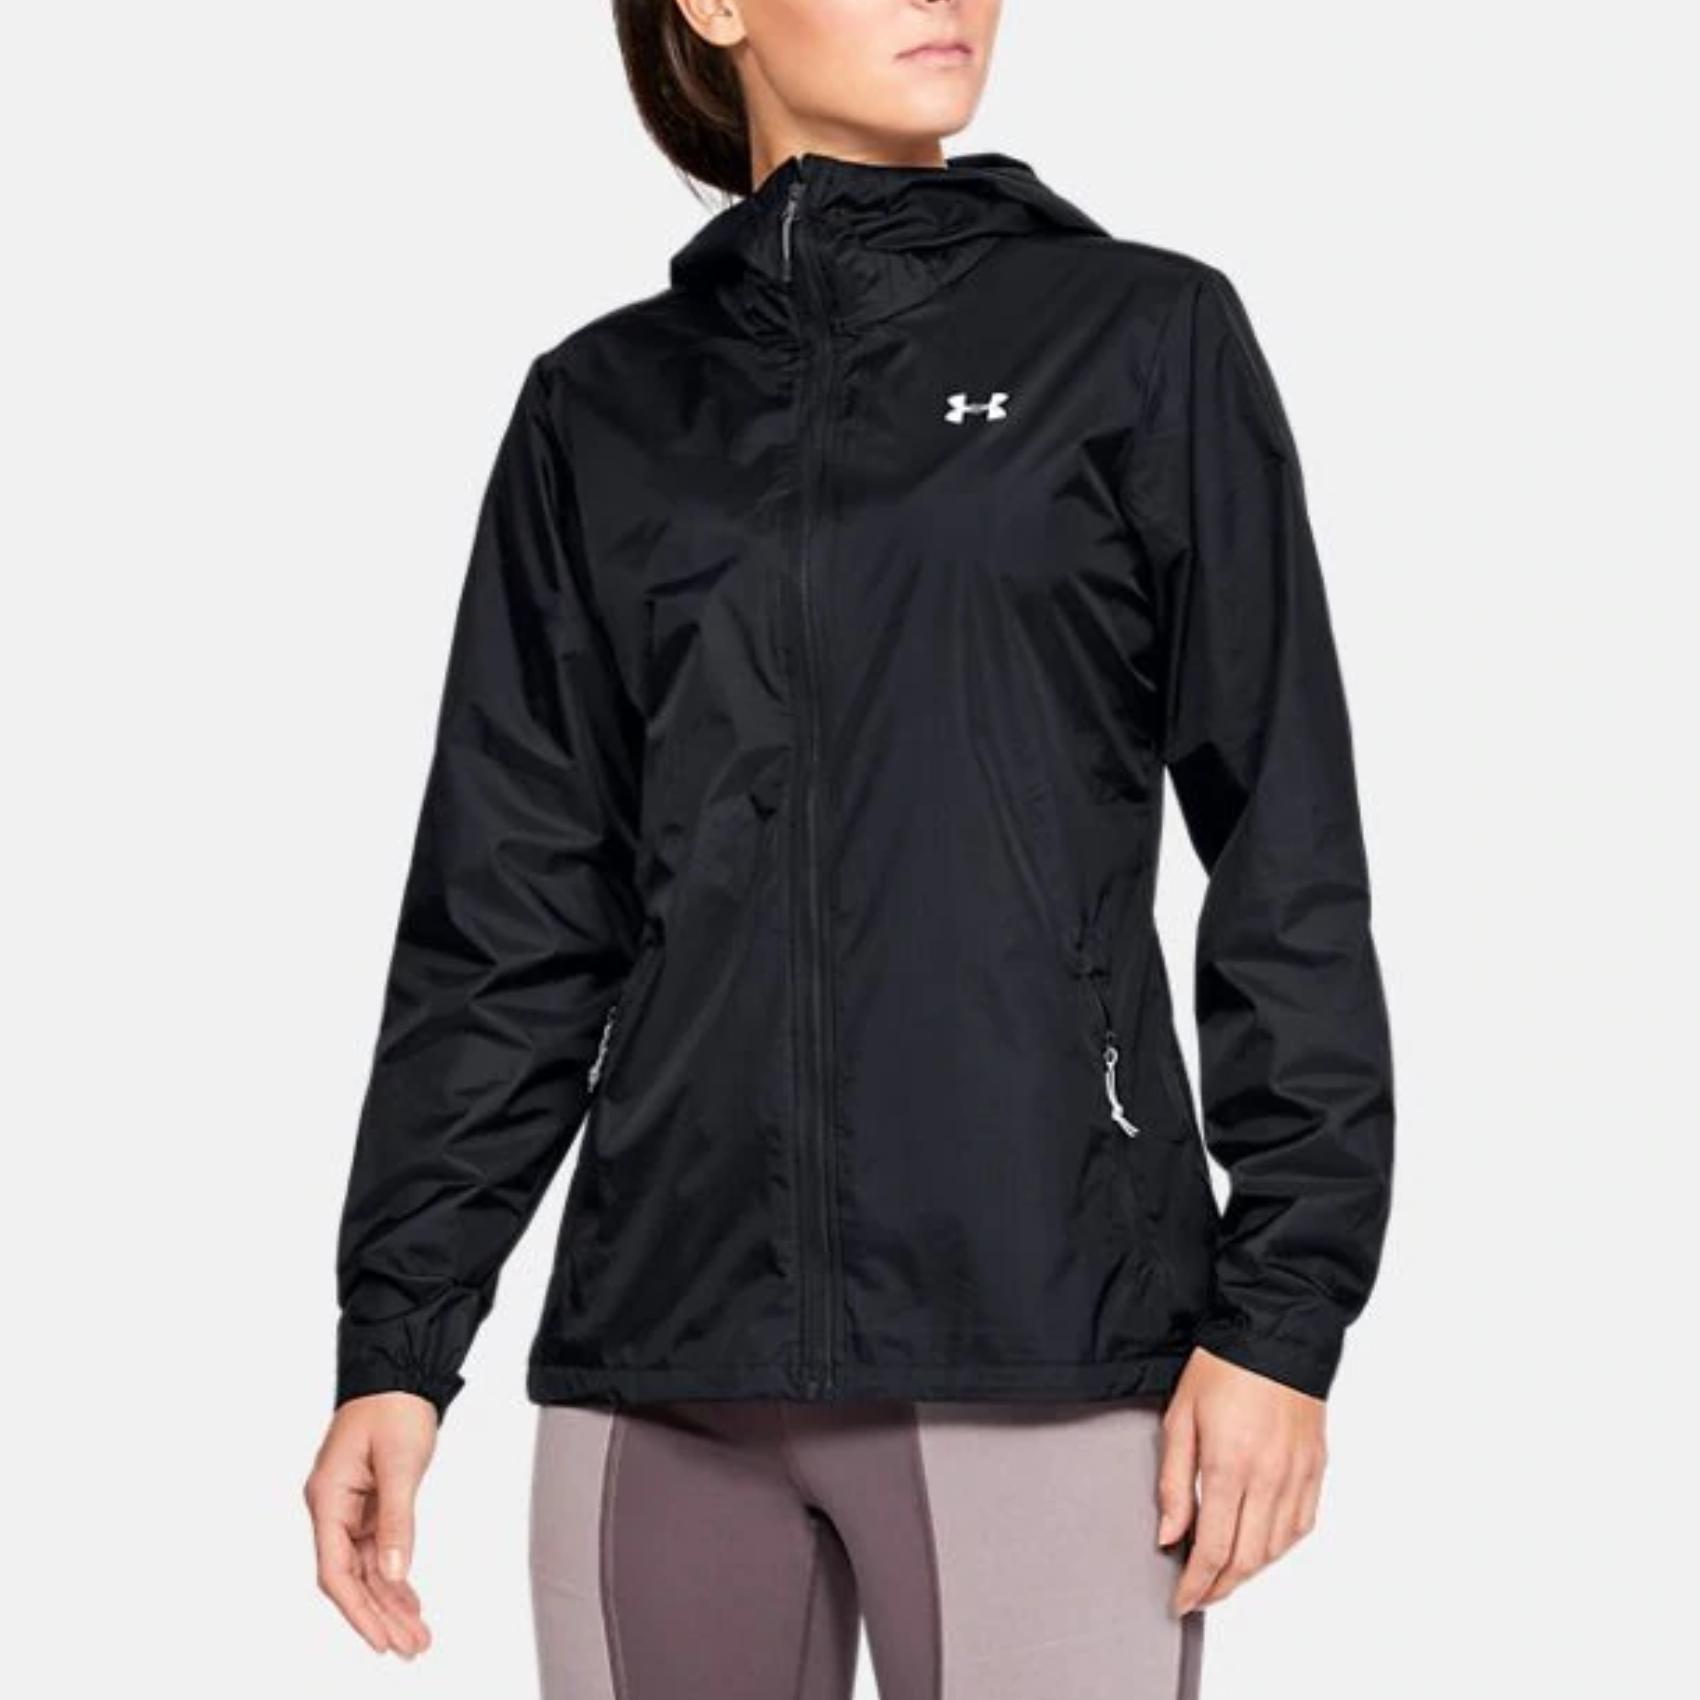 chaqueta de lluvia de vanguardia ua para mujer